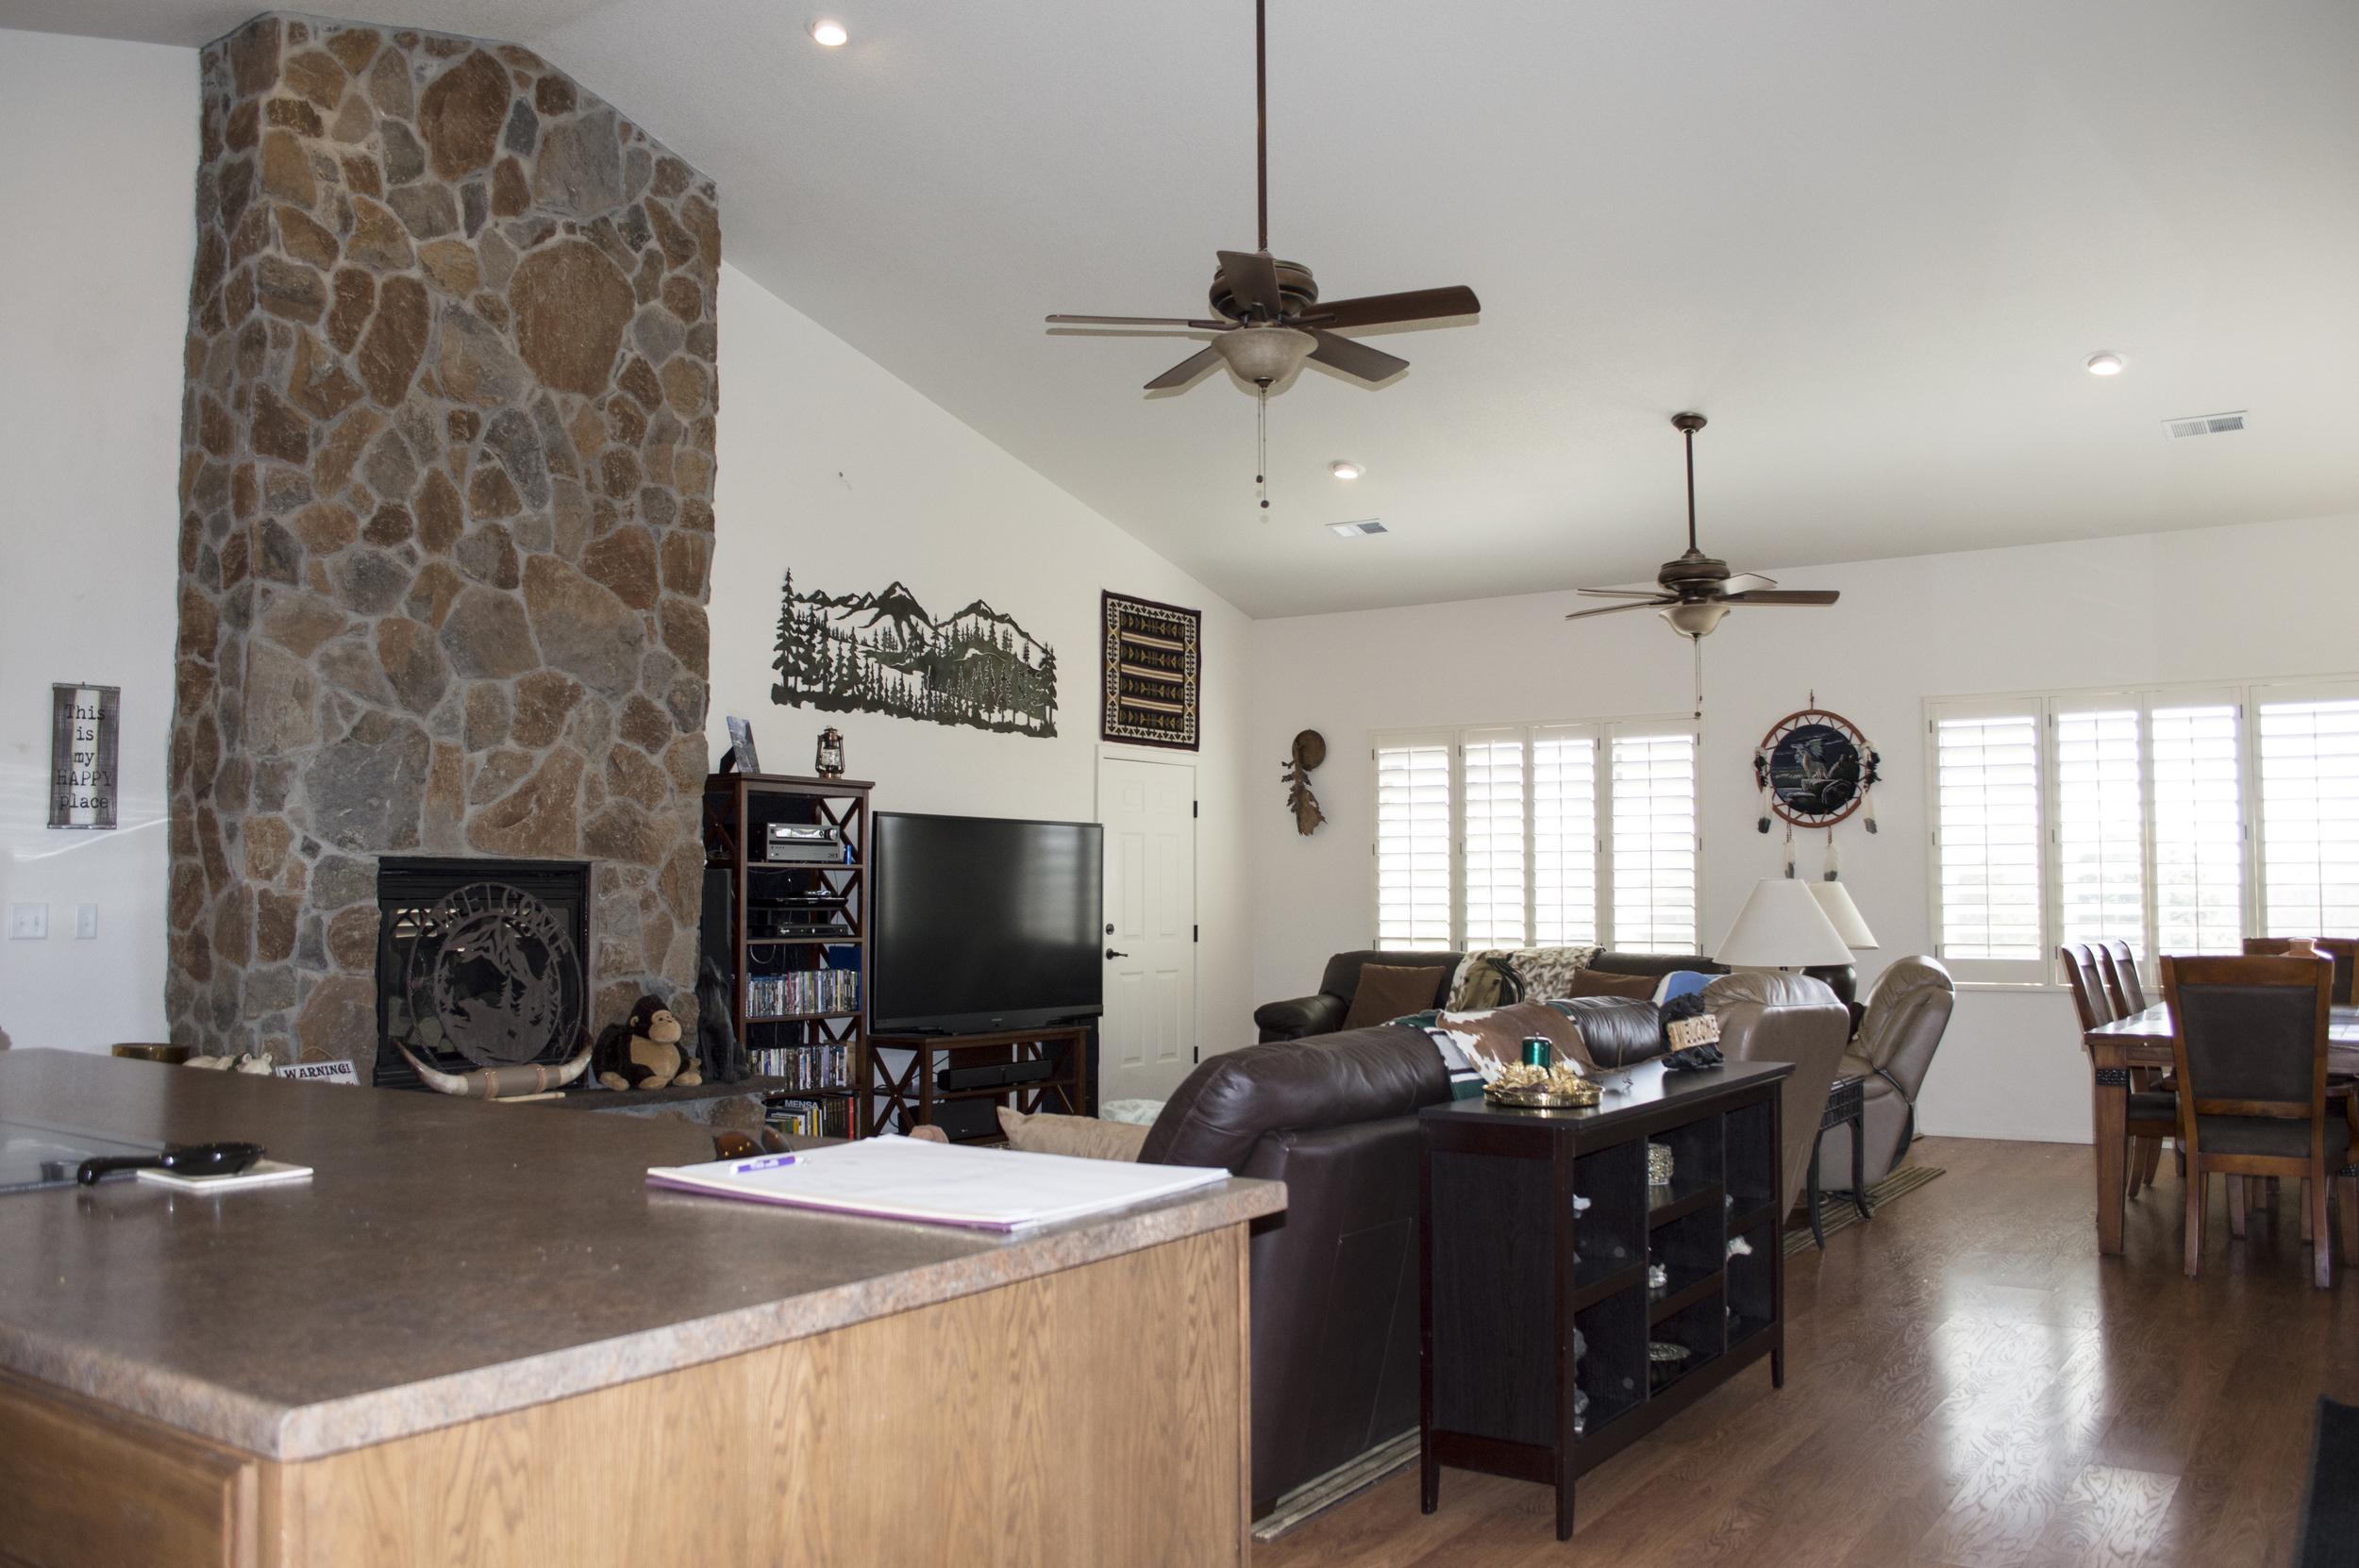 Dining room of a residential custom home near Flagstaff, Arizona.